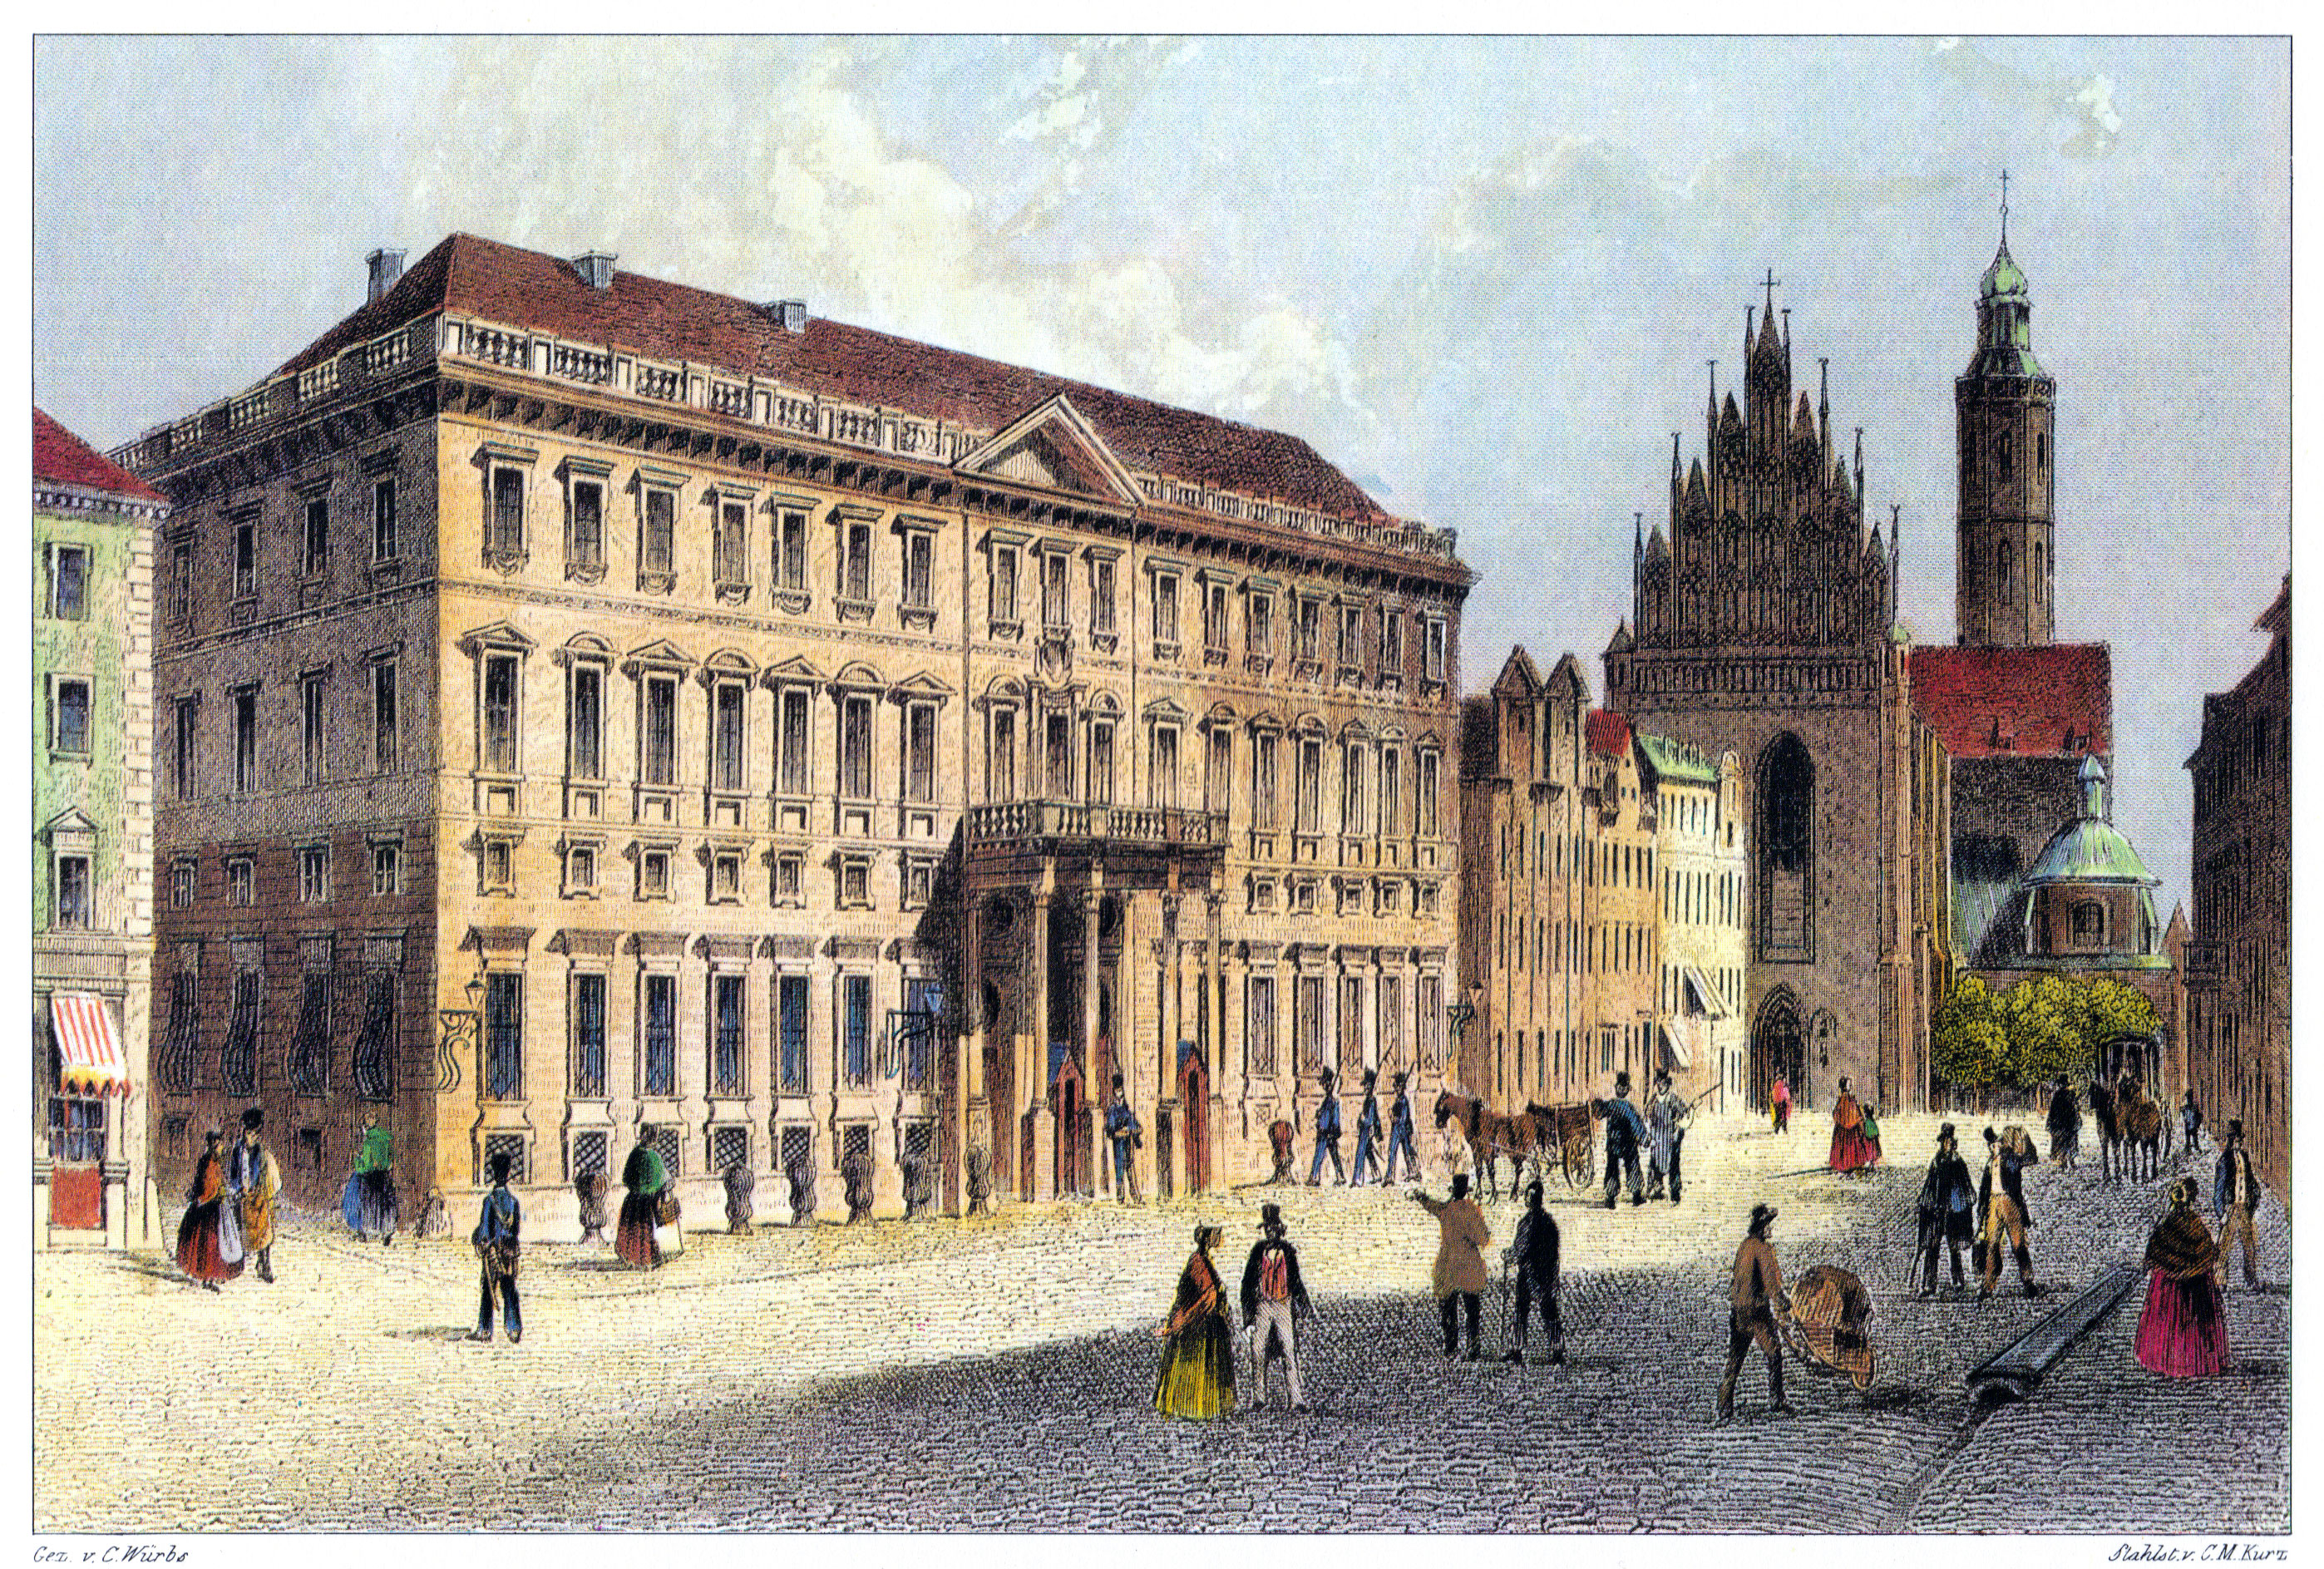 https://upload.wikimedia.org/wikipedia/commons/e/e8/Breslau_Dominikanerkirche_c1840.jpg